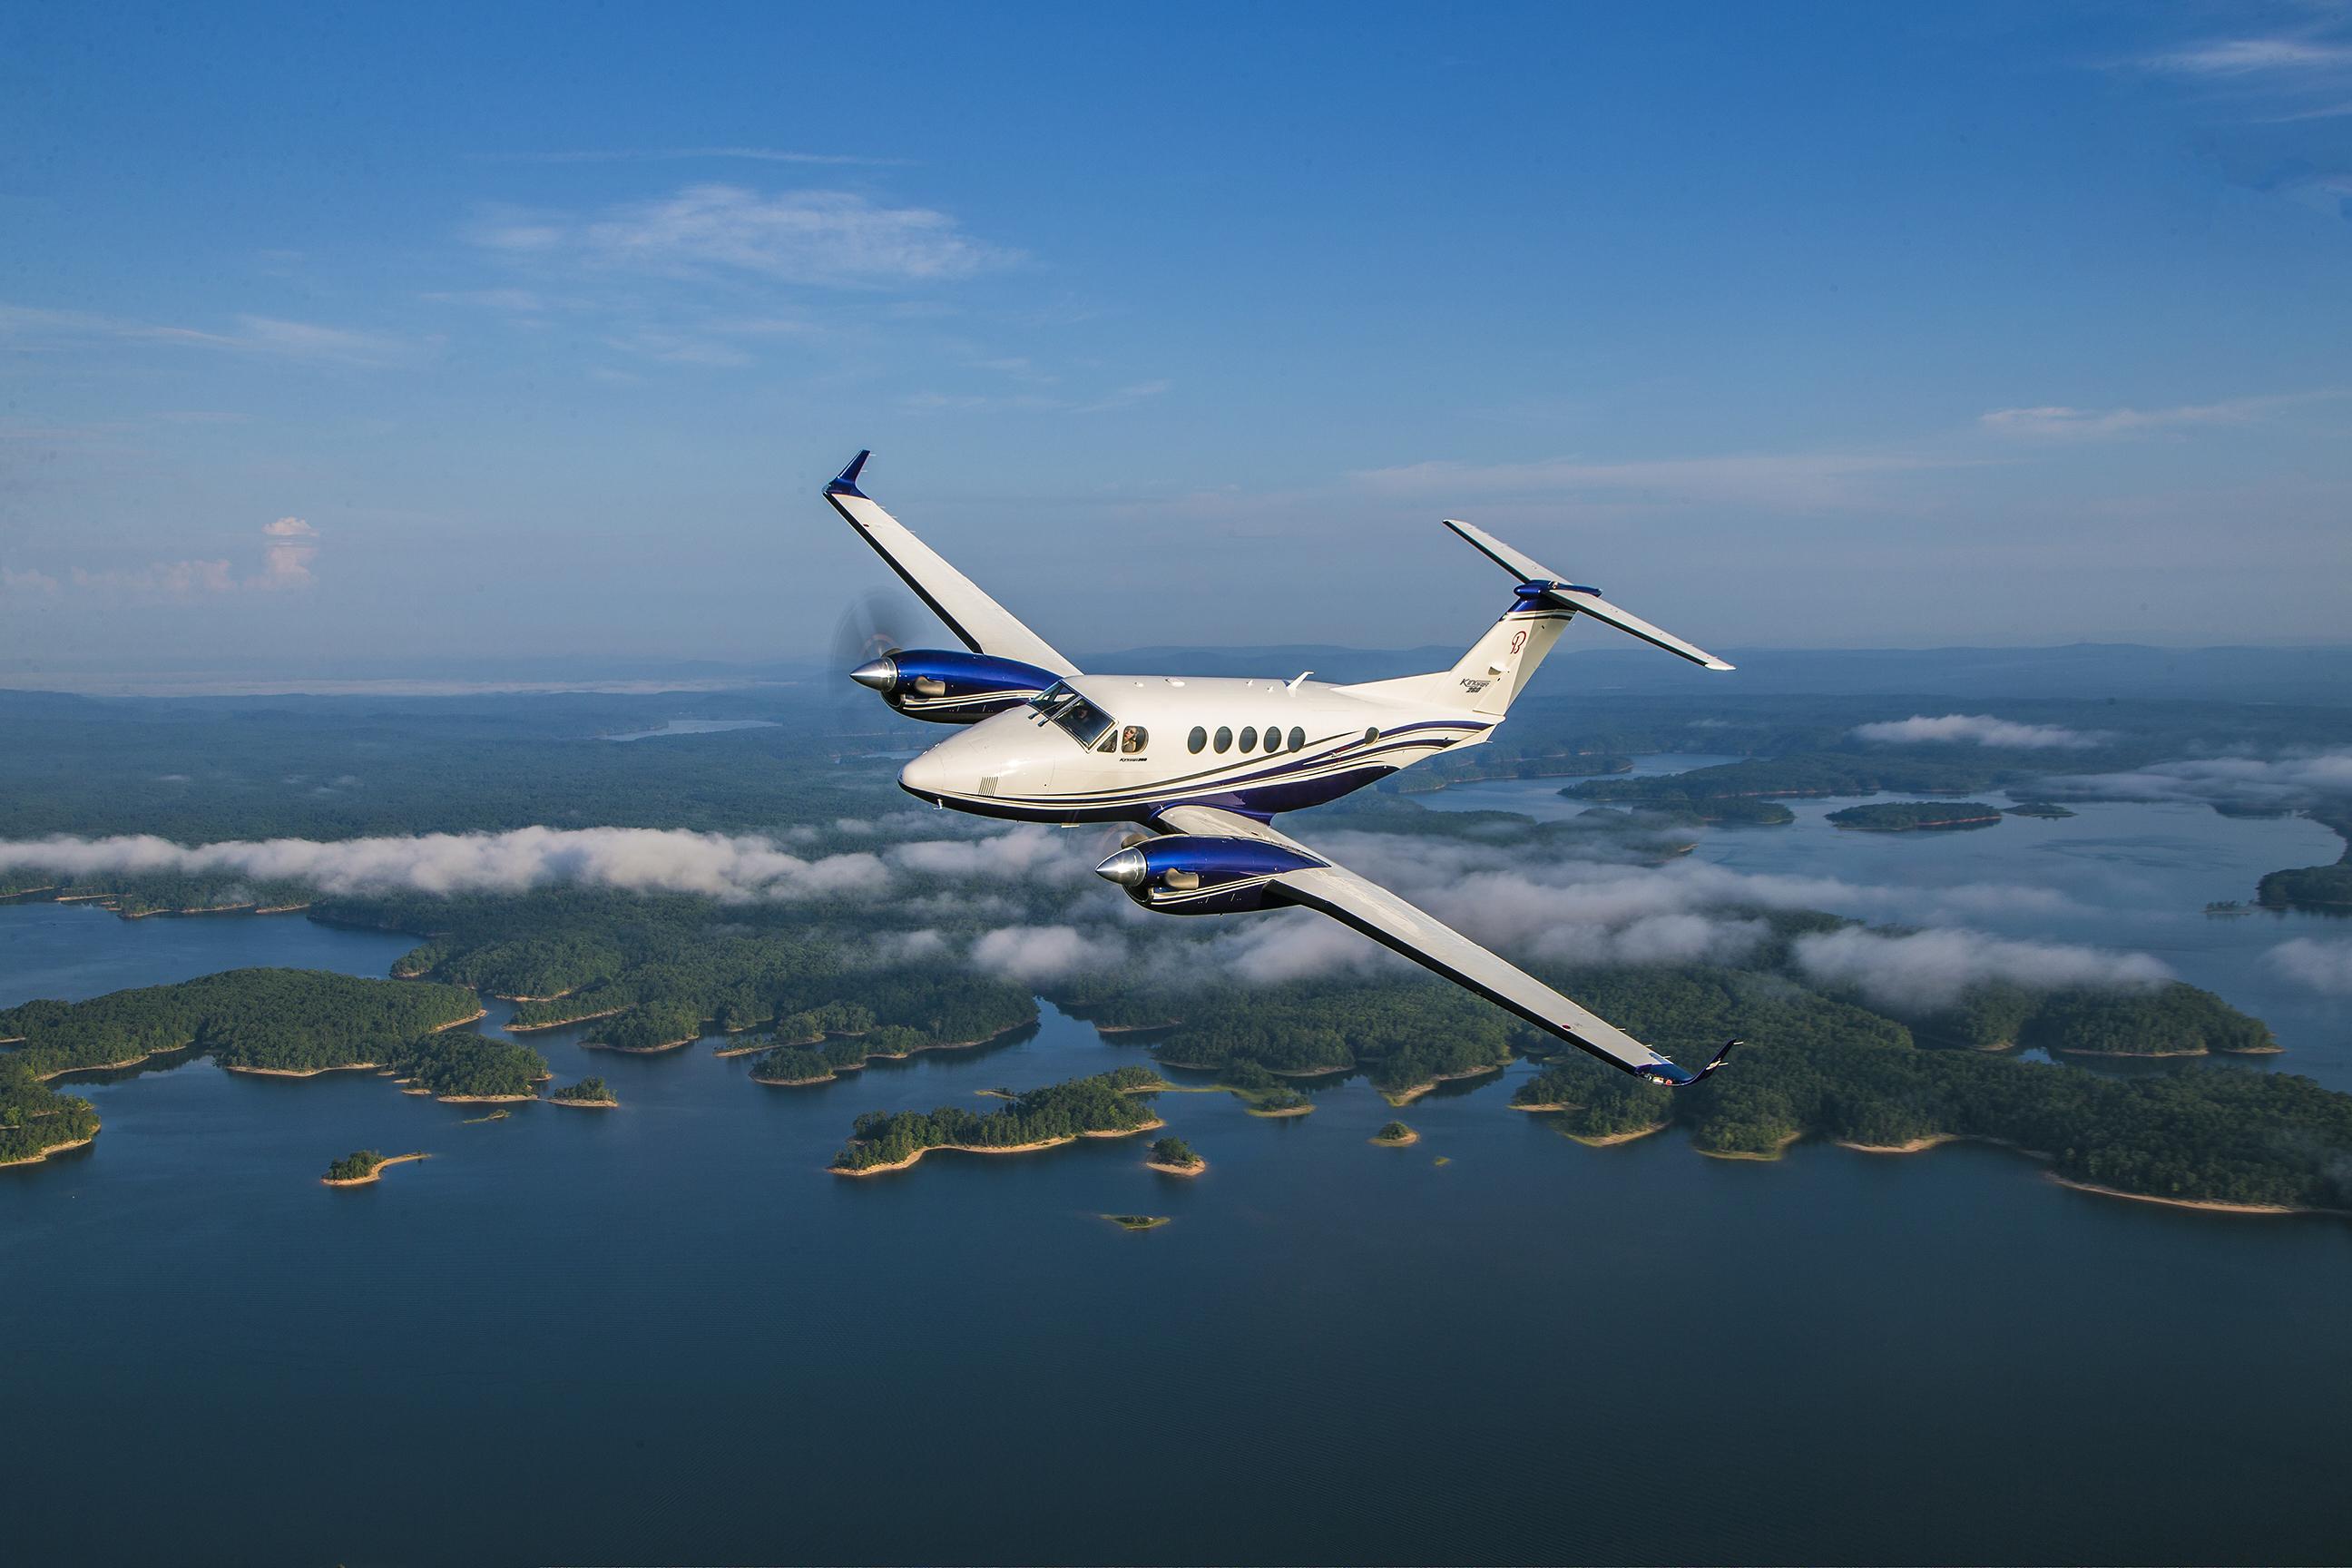 king-air-260-in-flight.ashx